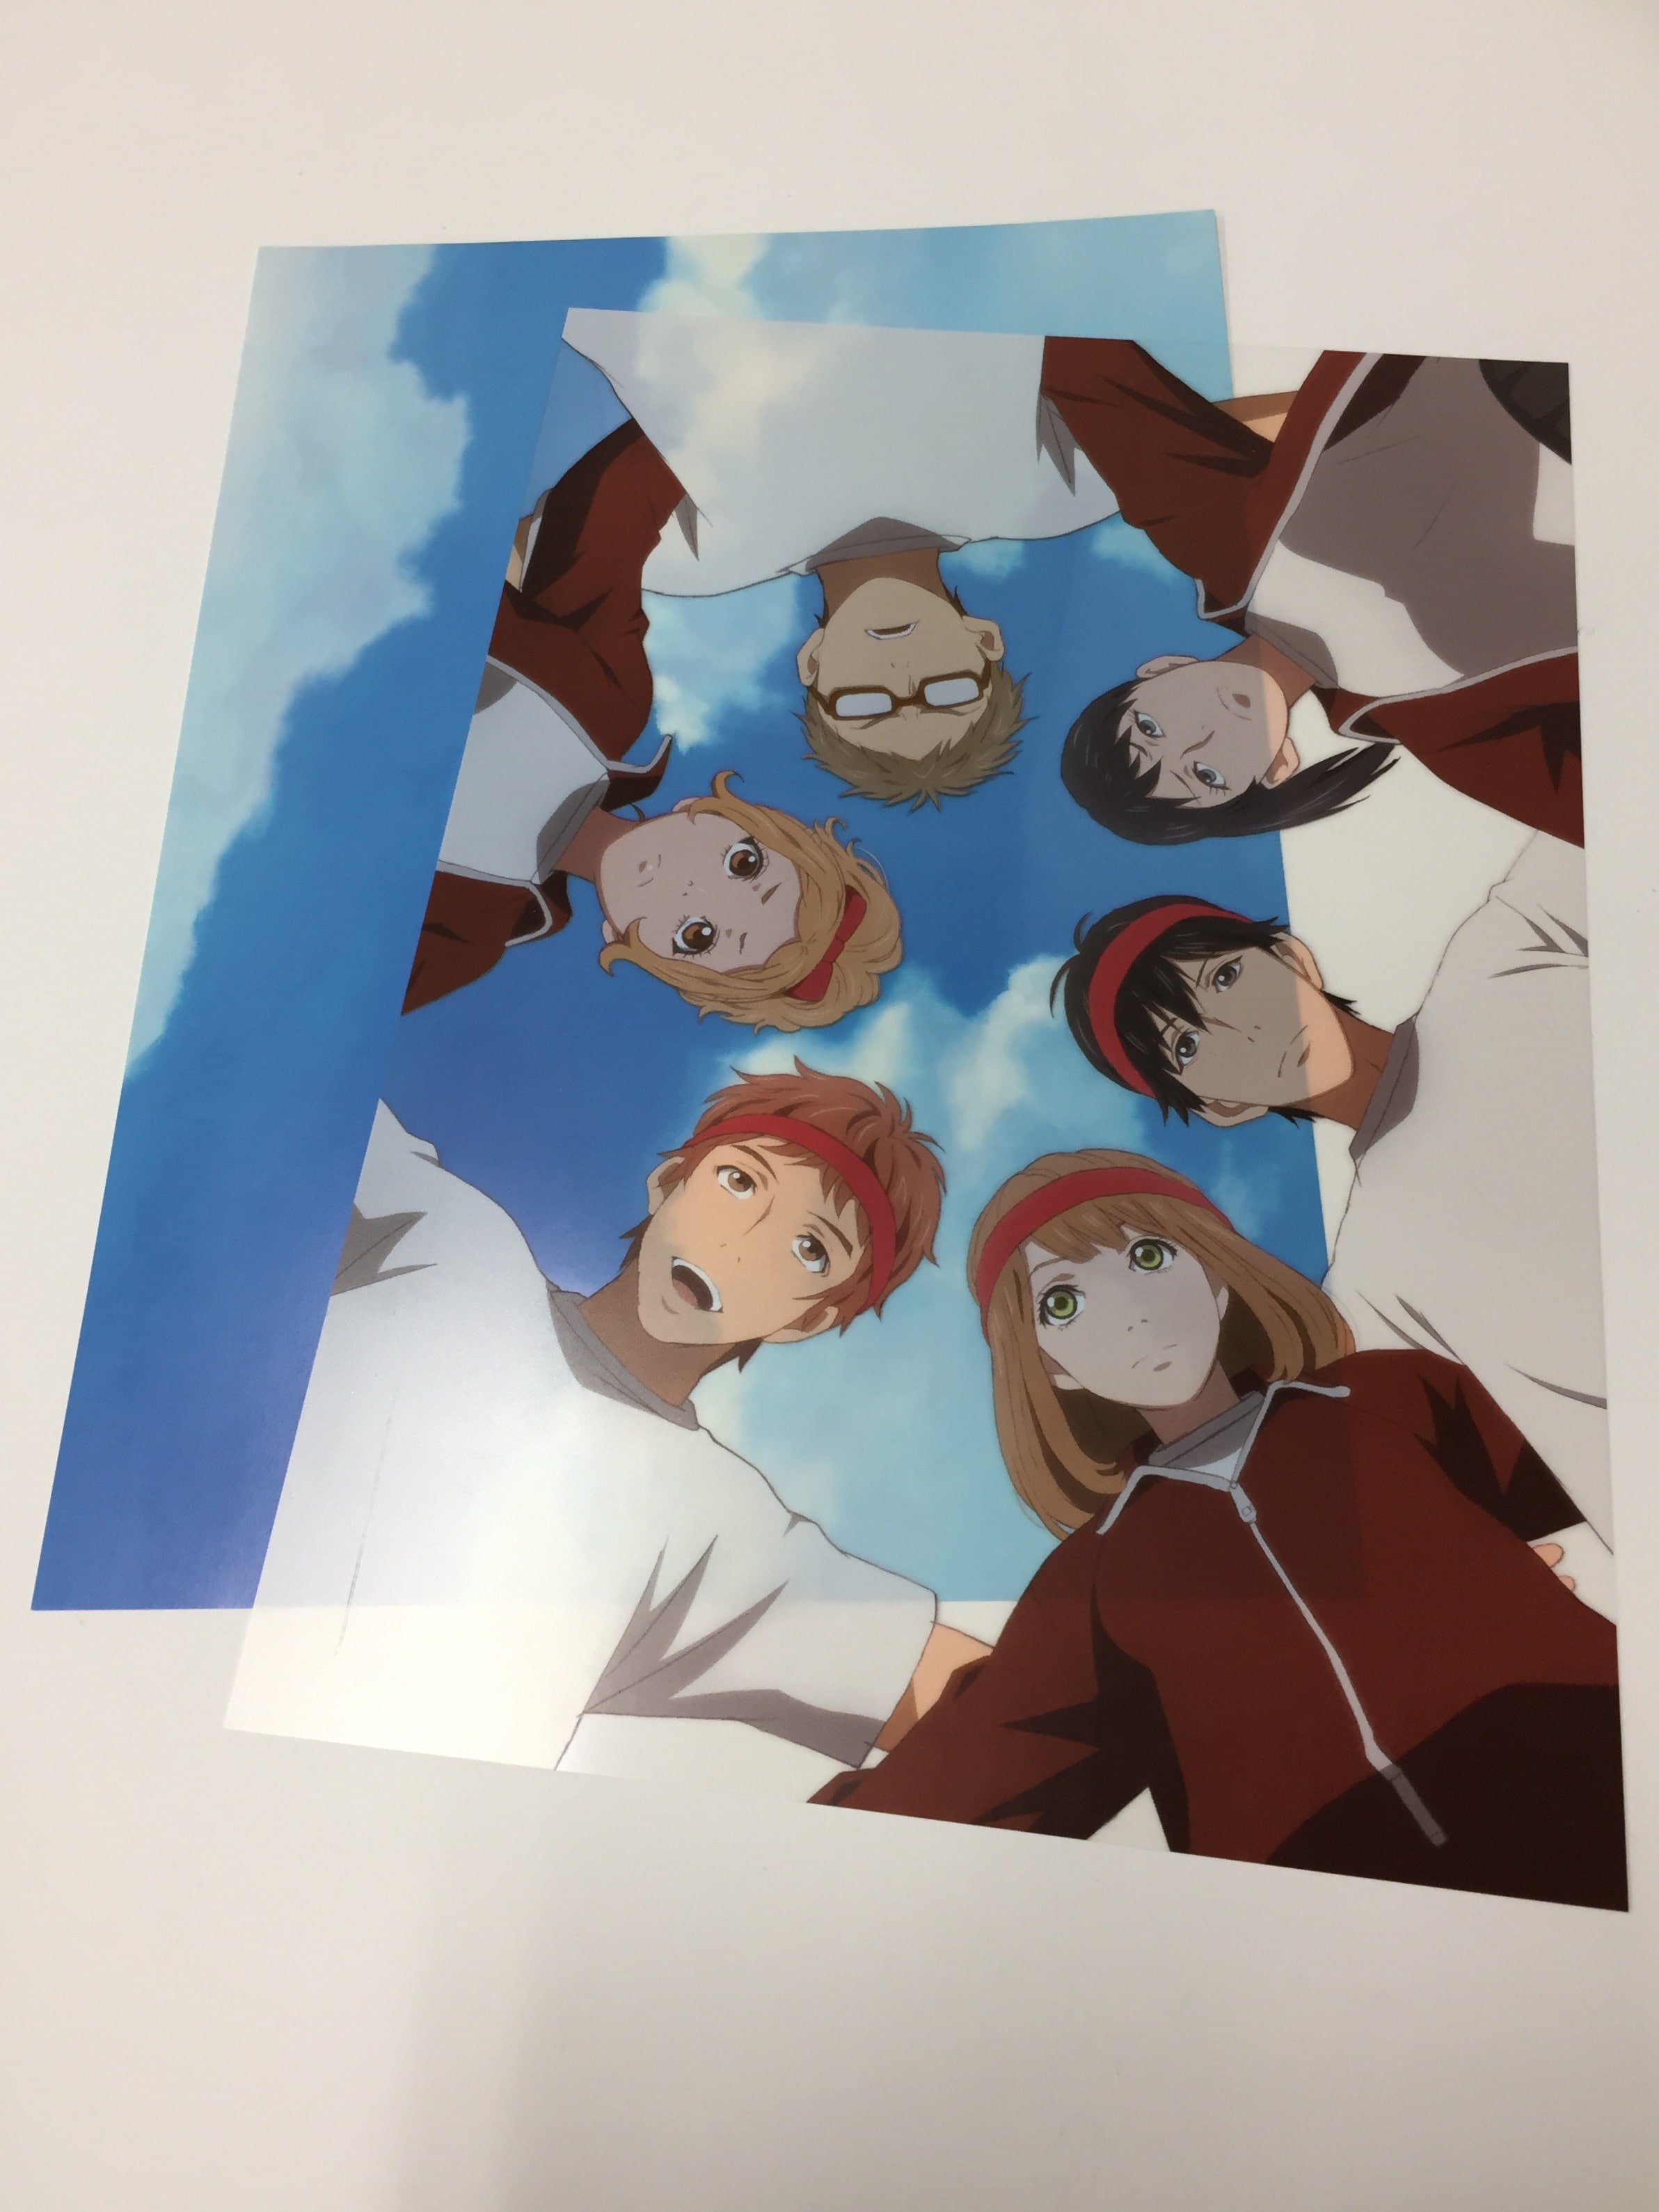 TVアニメ「orange」Vol.6 DVD 初回生産限定版